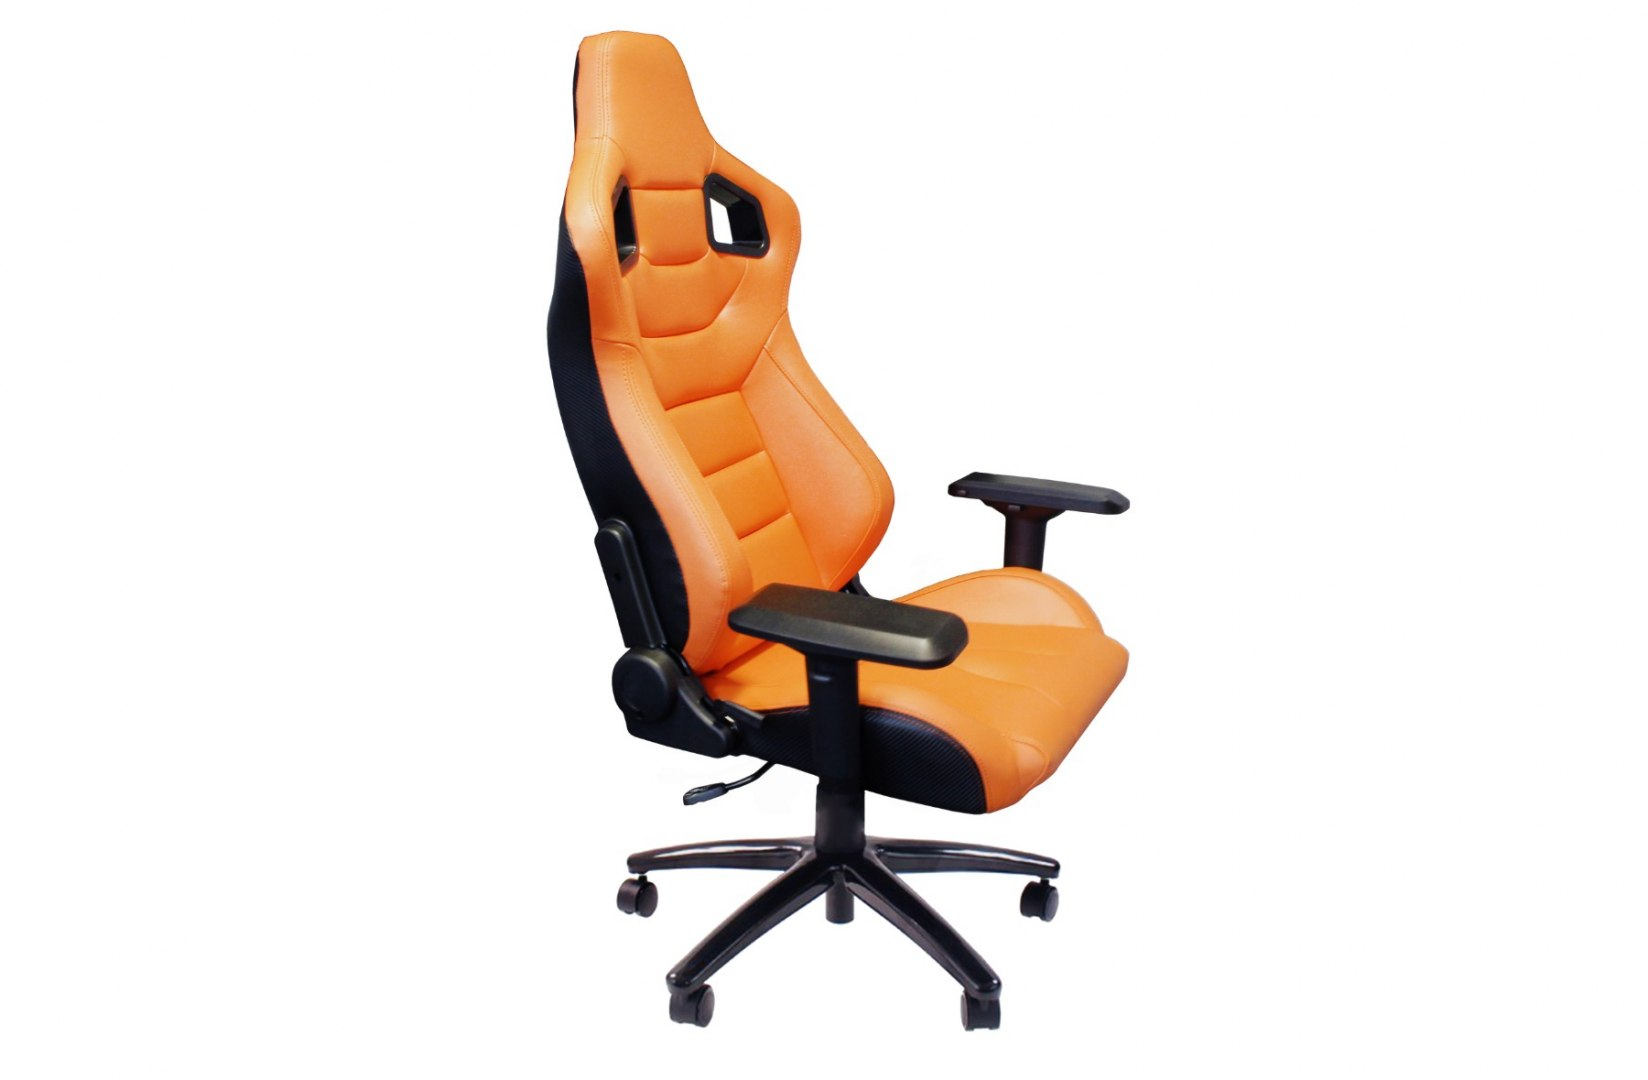 Fotel Biurowy Glock Orange - GRUBYGARAGE - Sklep Tuningowy